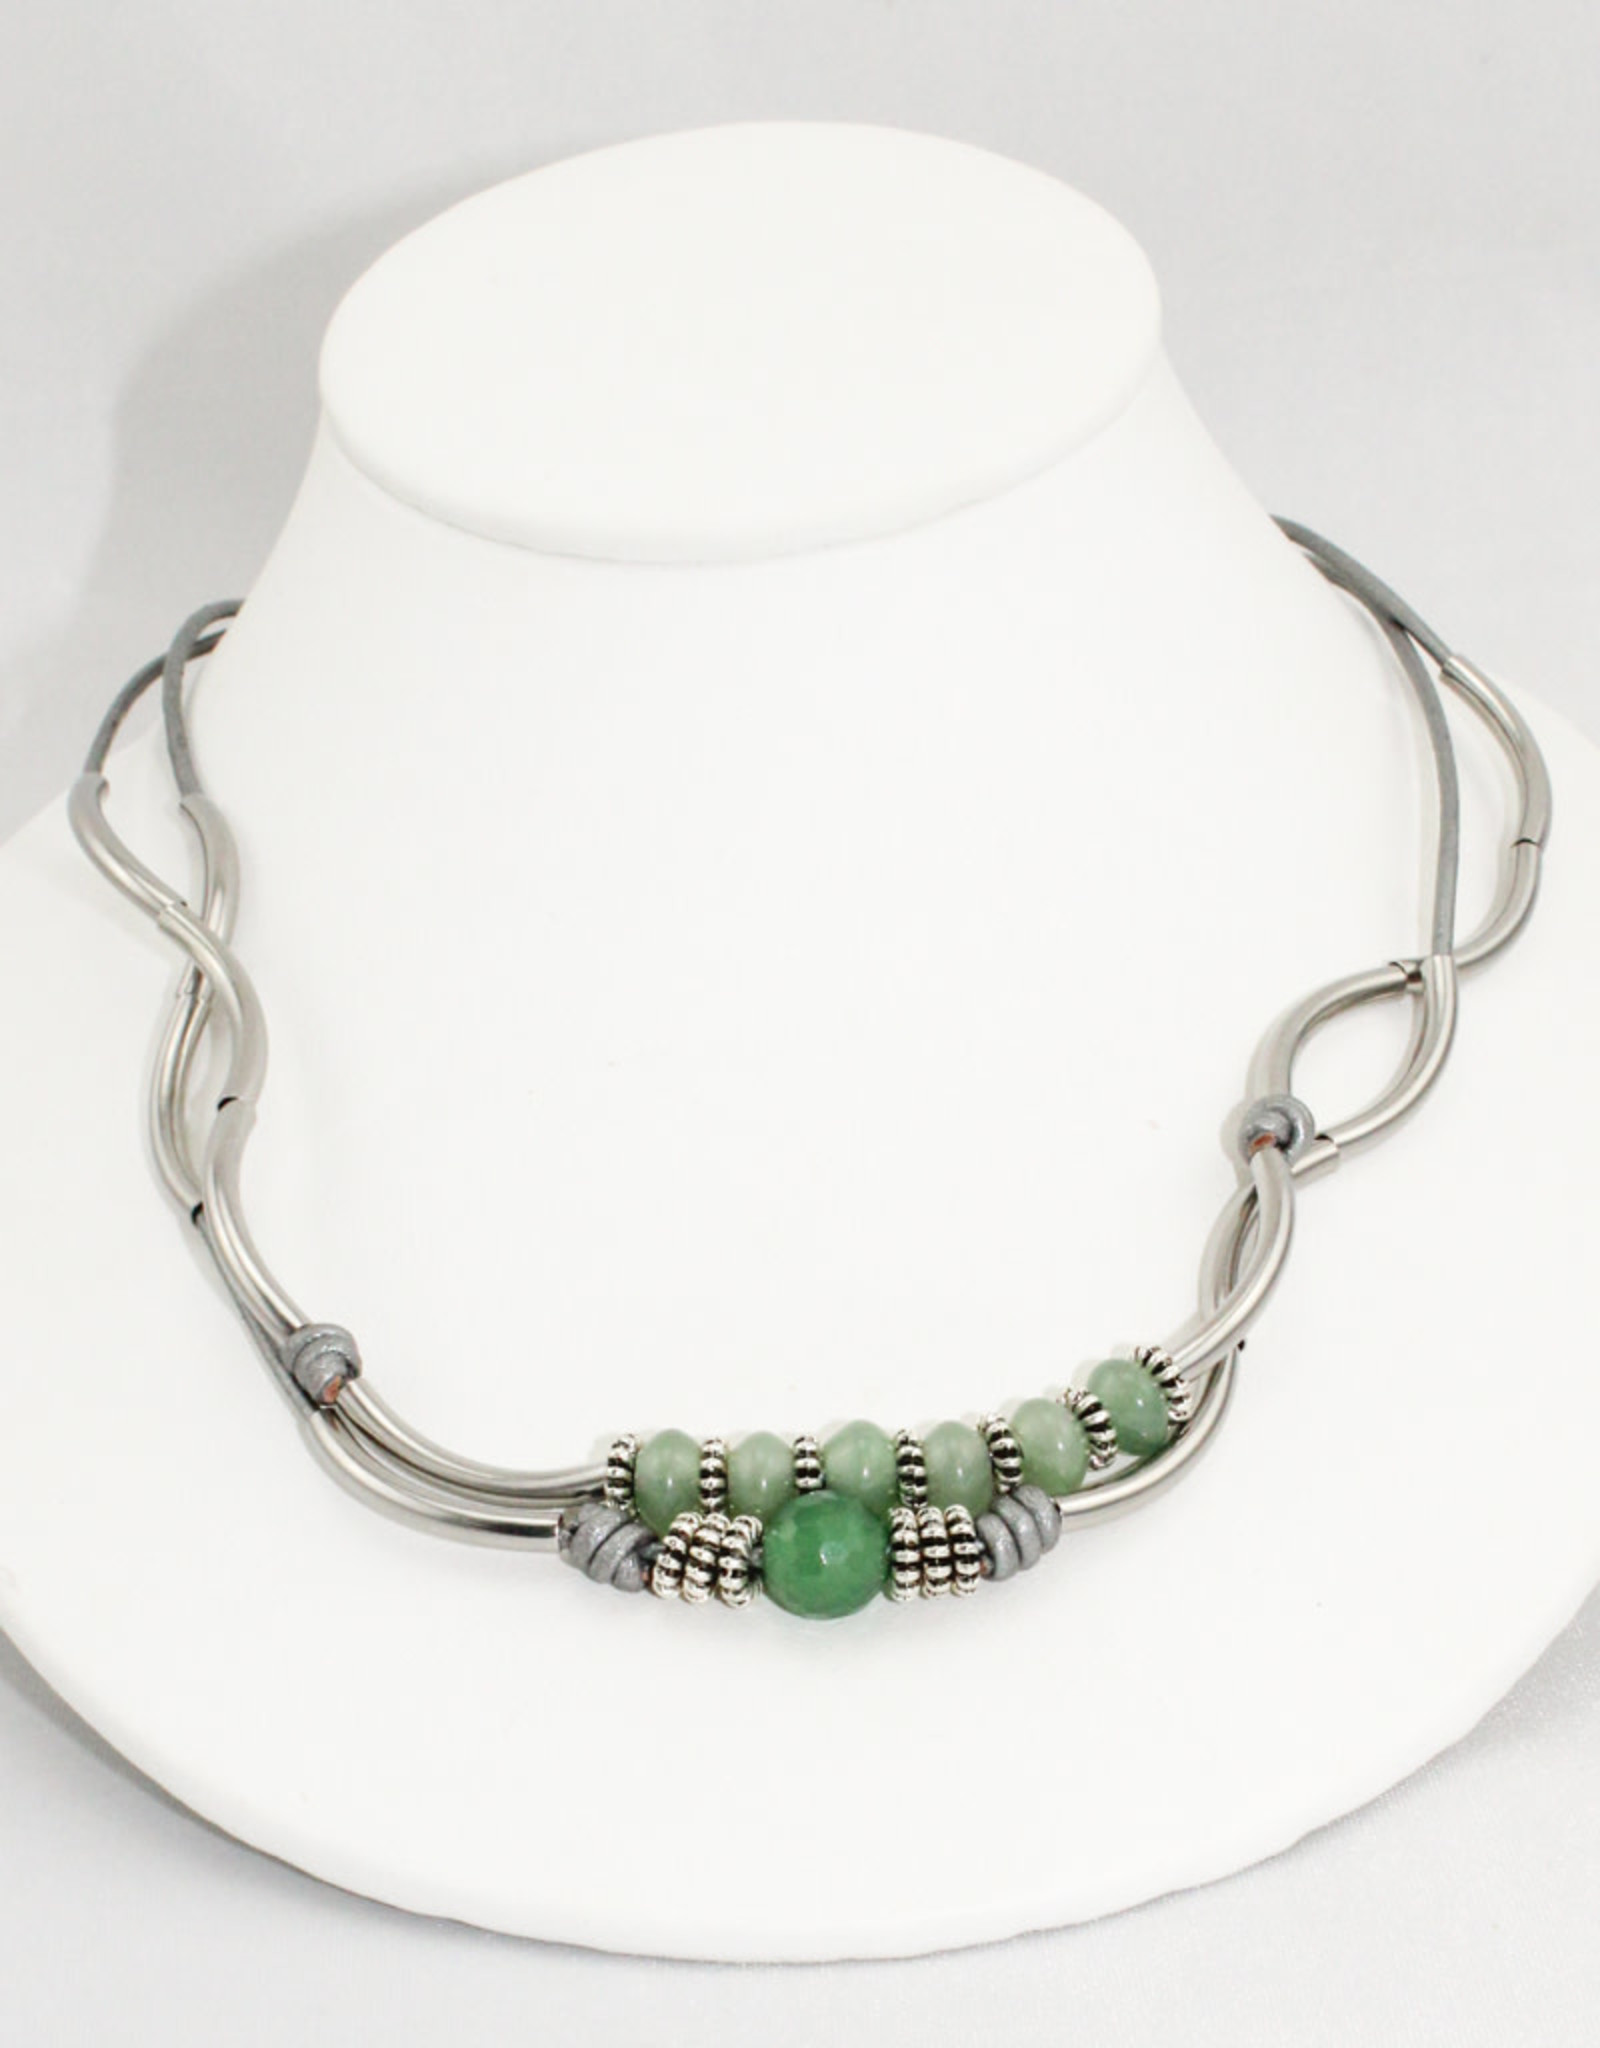 Lizzy James Simone Met Silver 2 -SP-M Bracelet